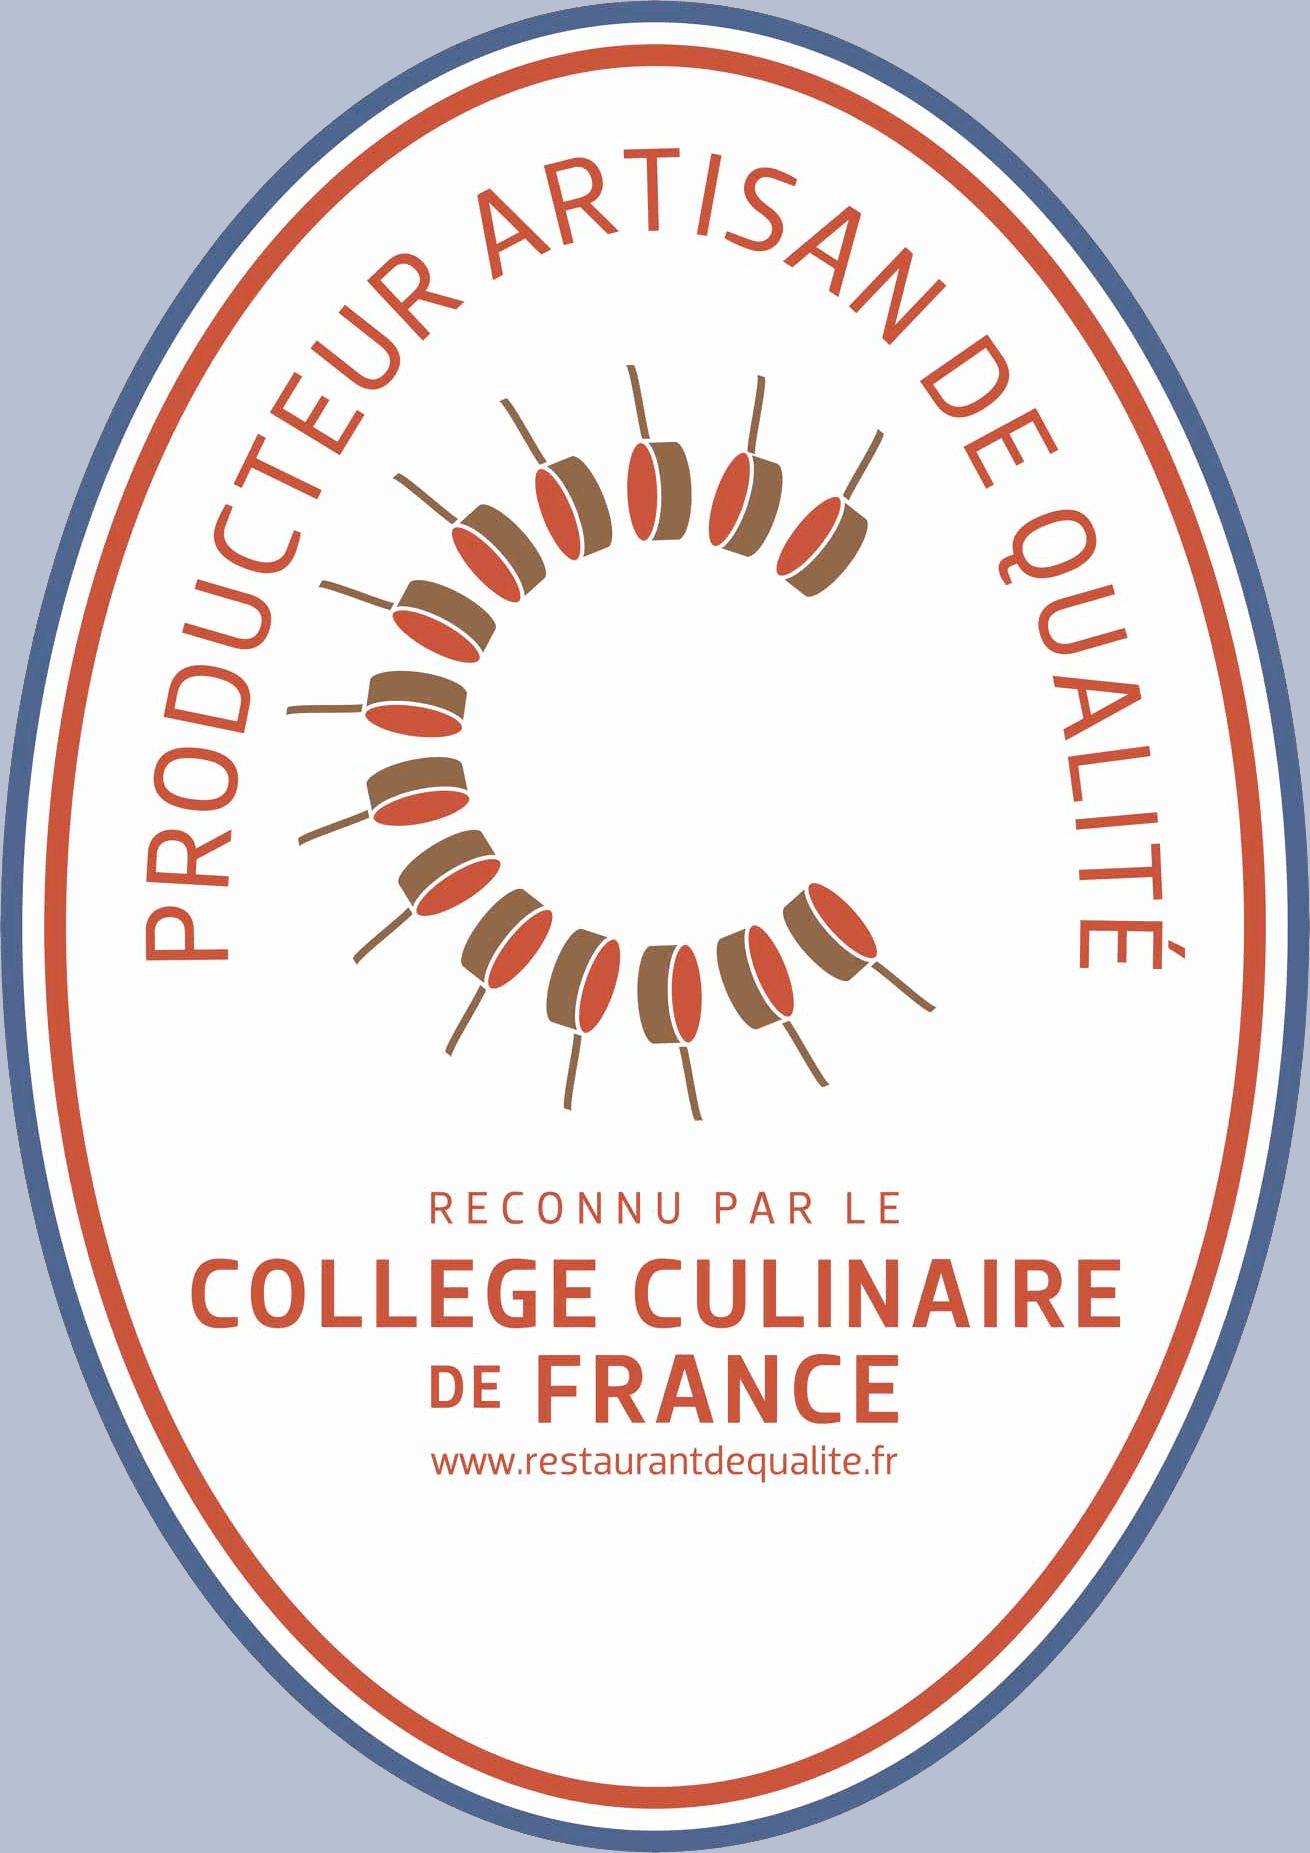 logo ccf